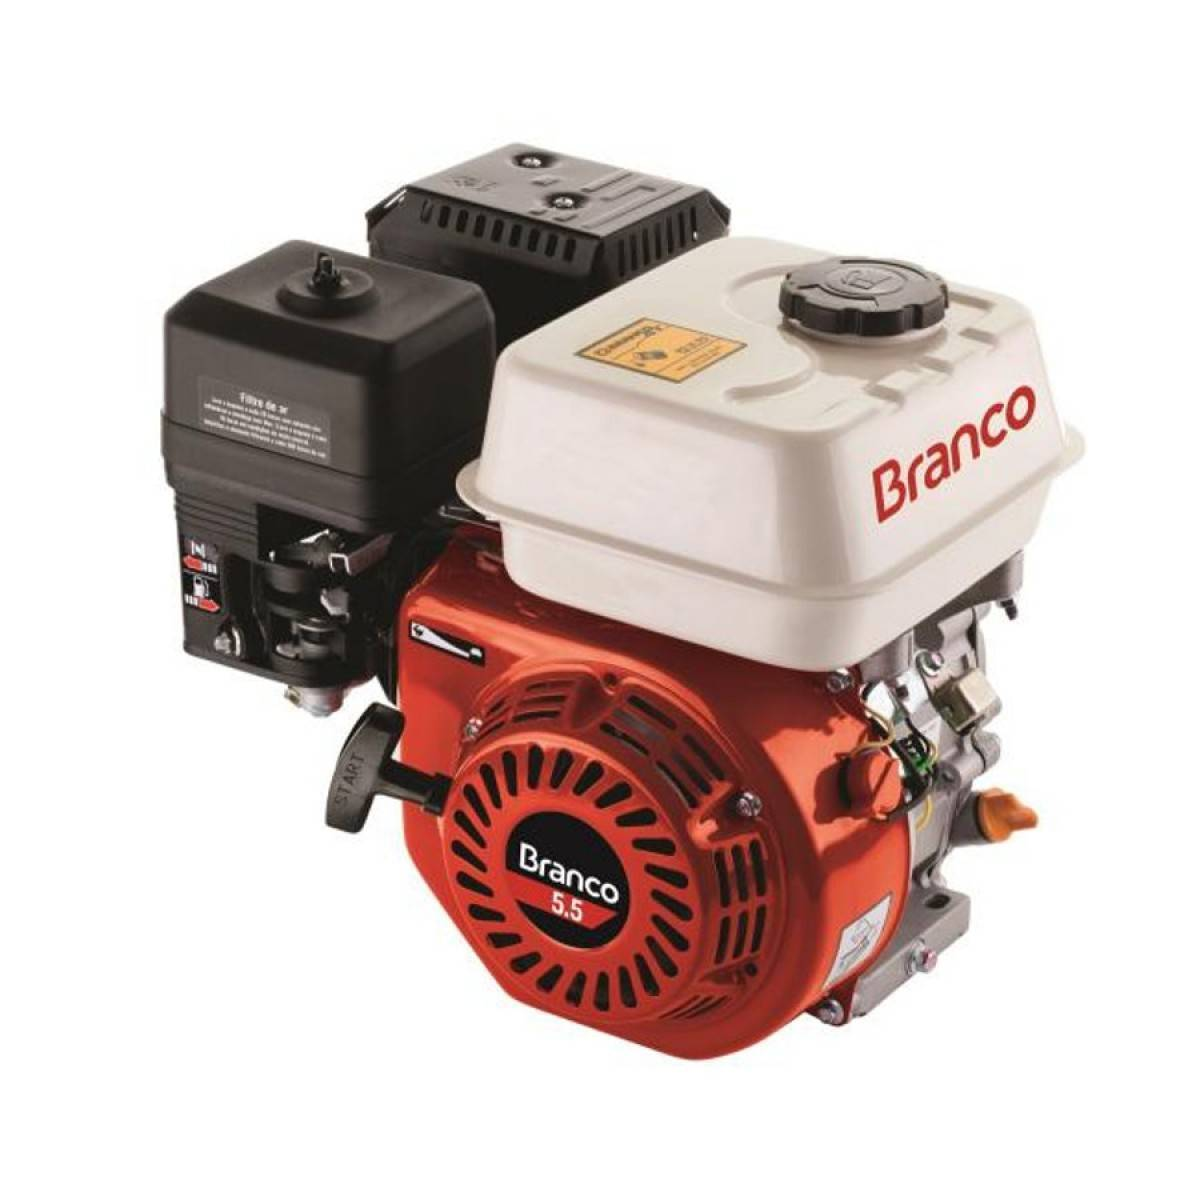 Motor Branco Gasolina B4T 8,5CV Eixo H. Monocili. - BSS Maquinas